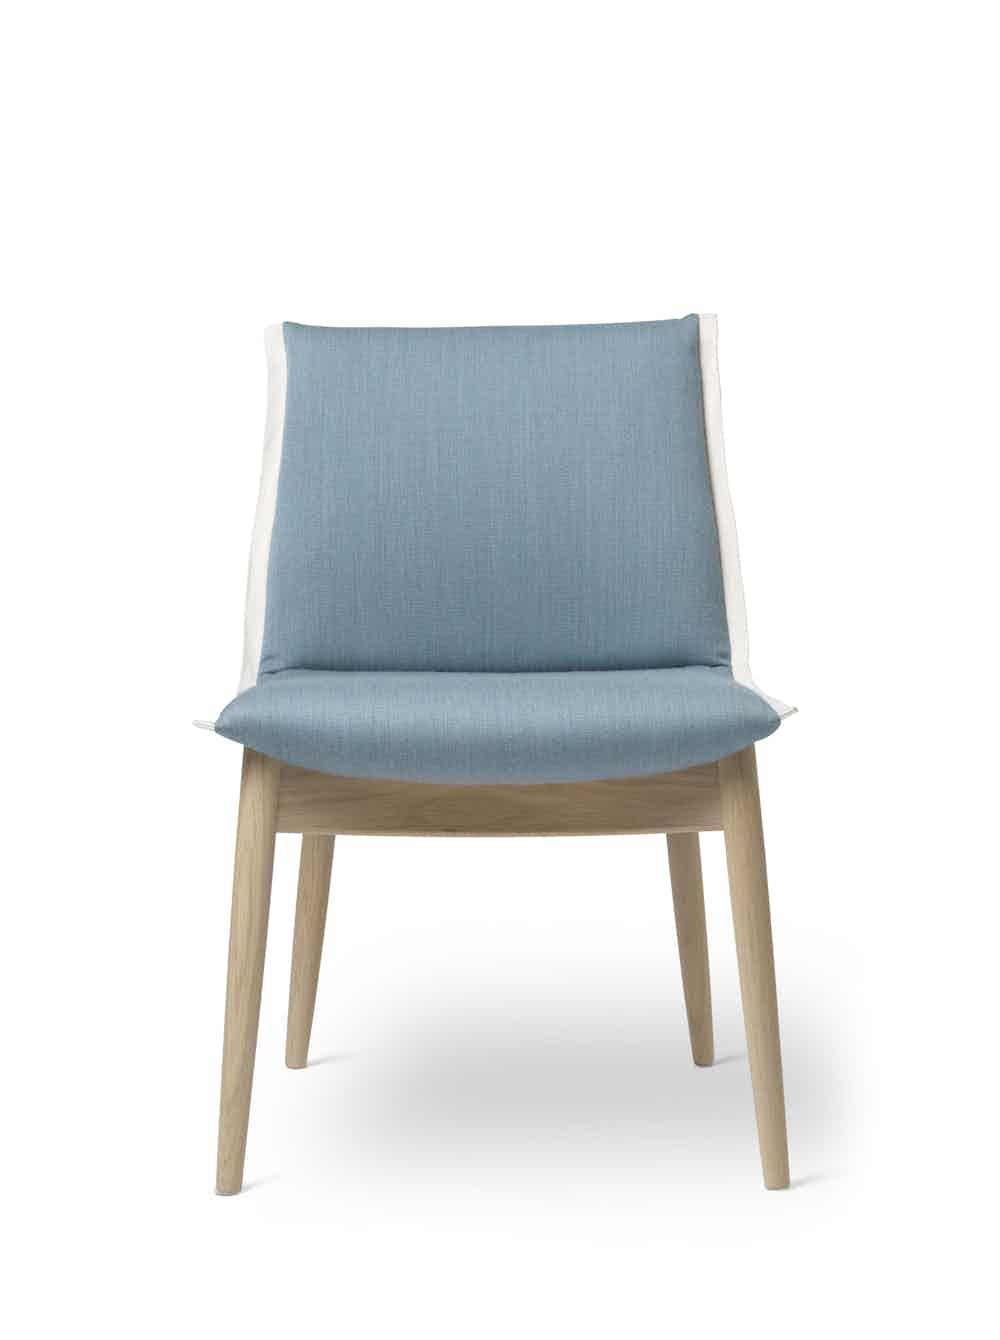 Carl-hansen-and-son-e004-embrace-dining-chair-oak-blue-front-haute-living